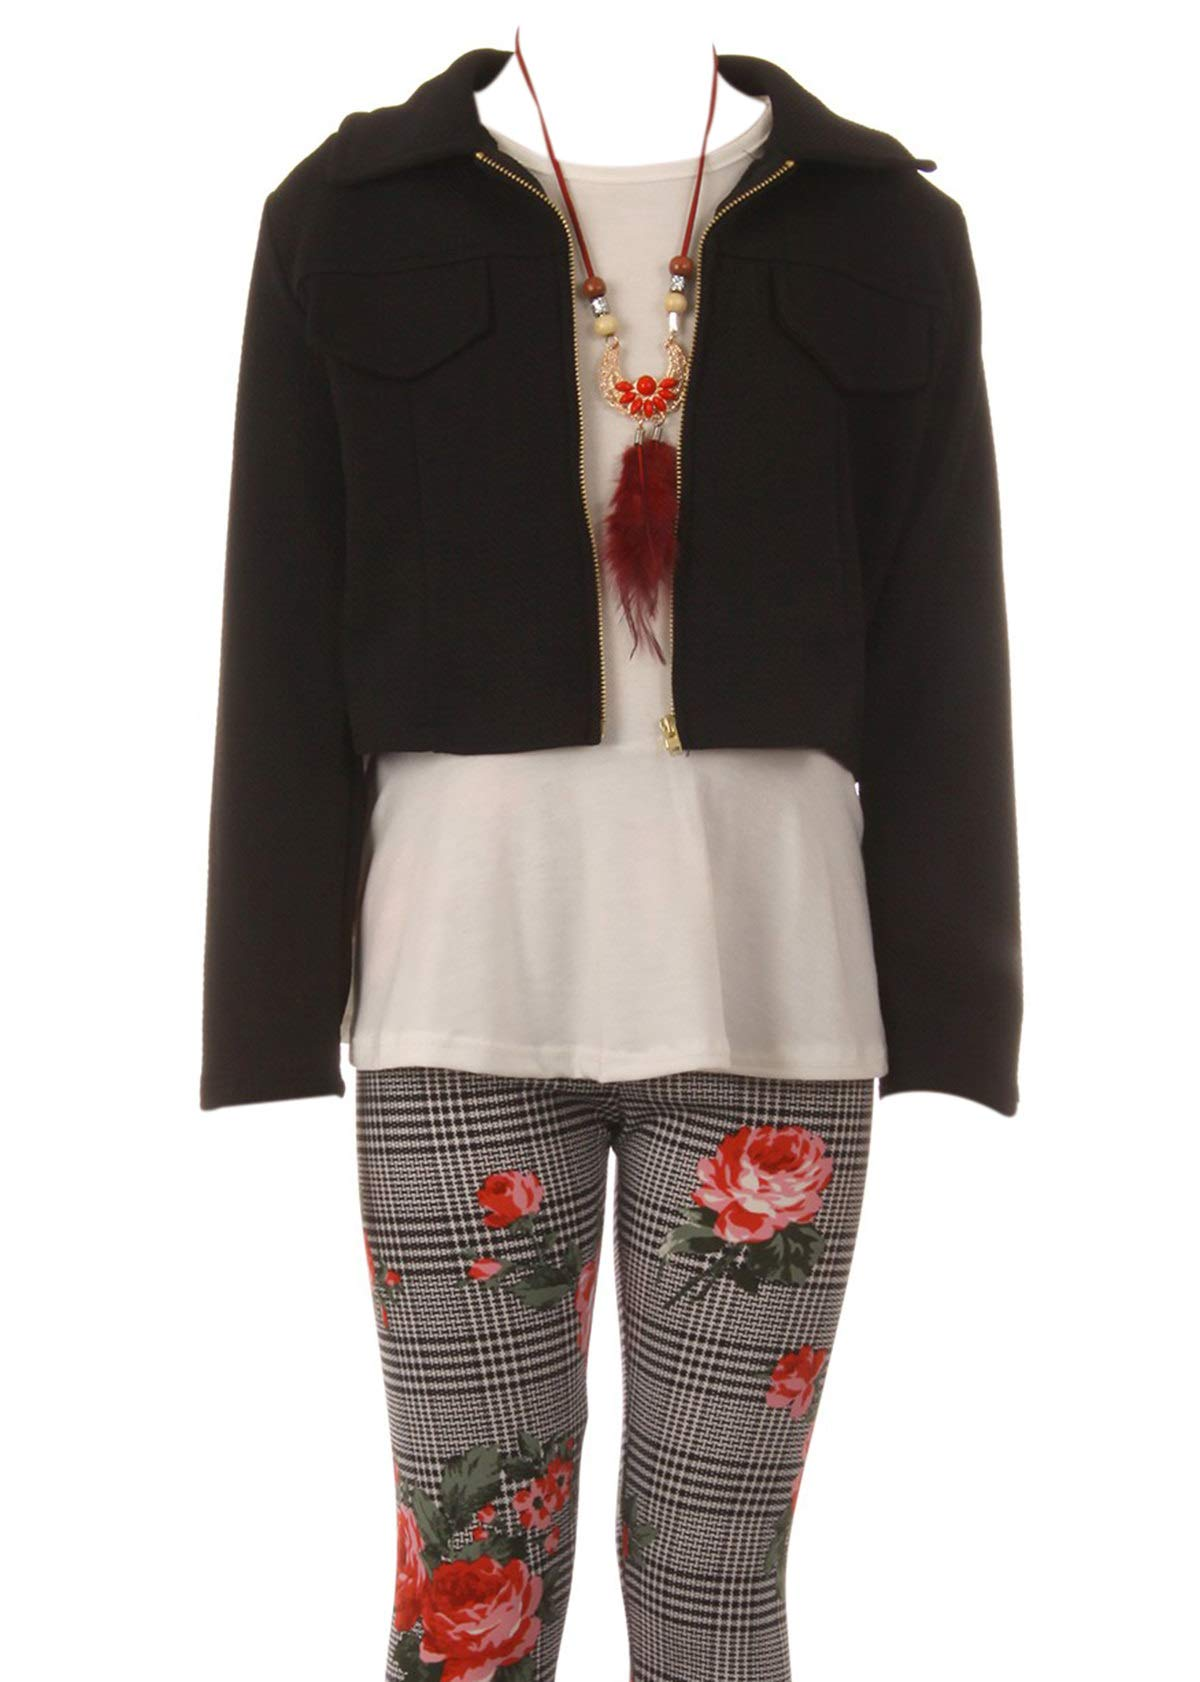 Big Girl Jackets Necklace Shirt Tank Pant Legging Girls 4 Pieces Clothing Set Coral 12 (21JK41S)